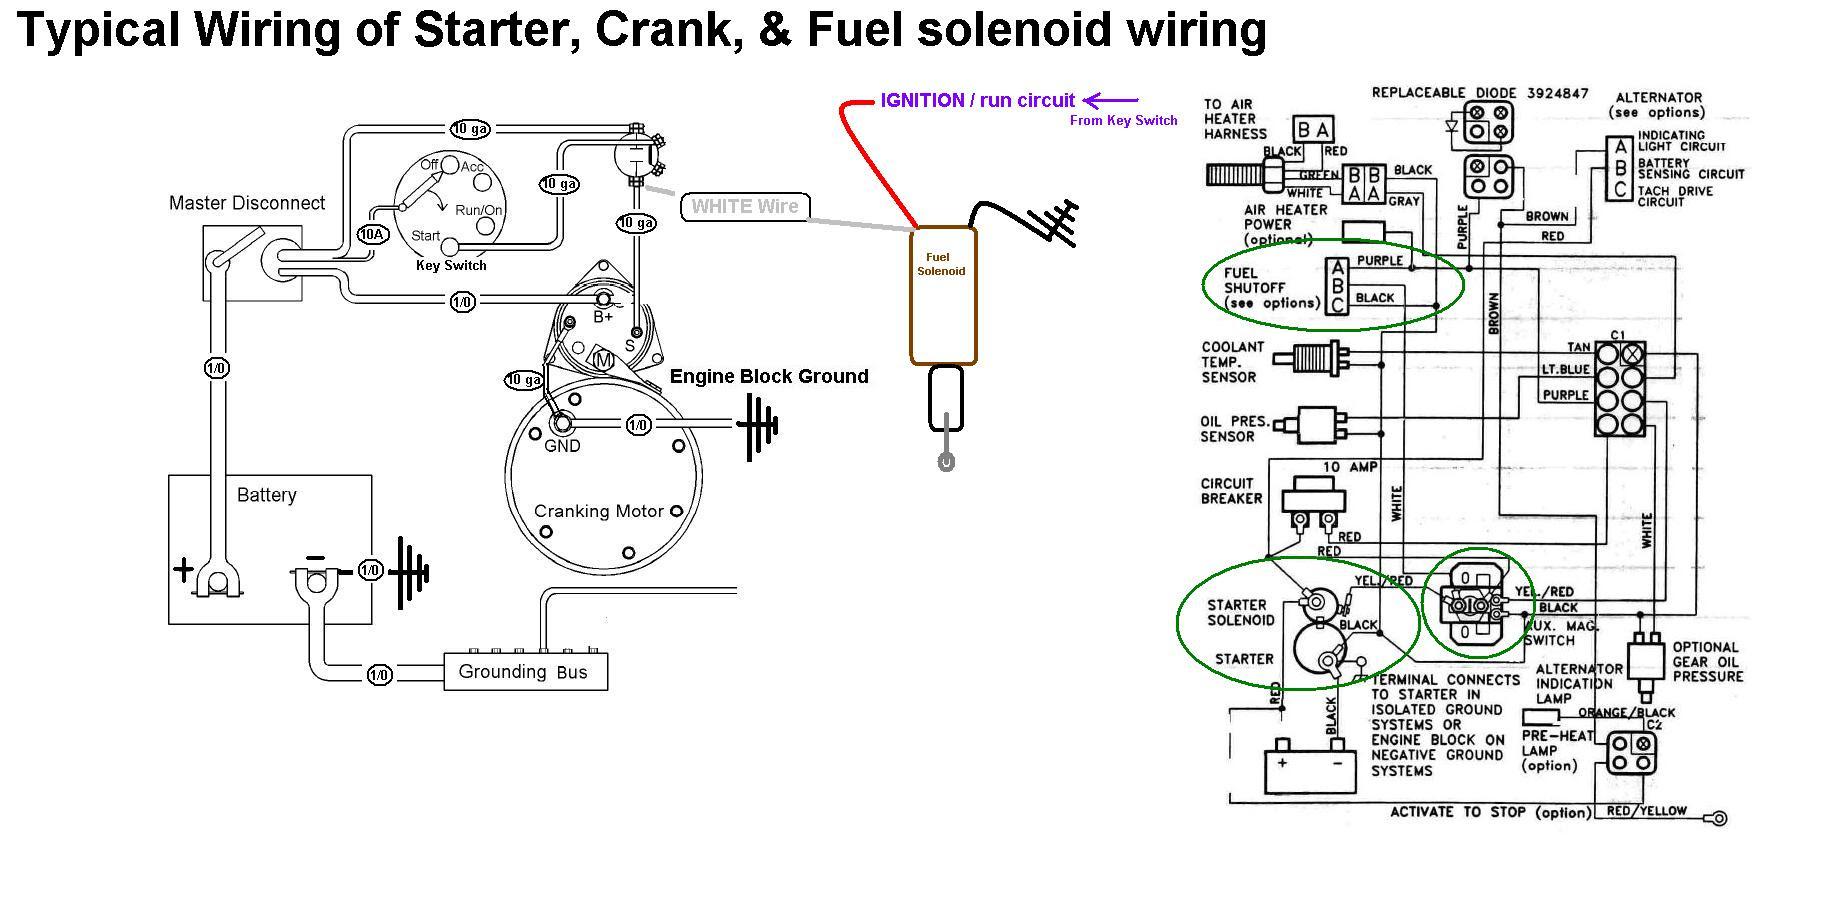 Starter, Crank & Fuel Shutoff Solenoid Wiring - Seaboard ...